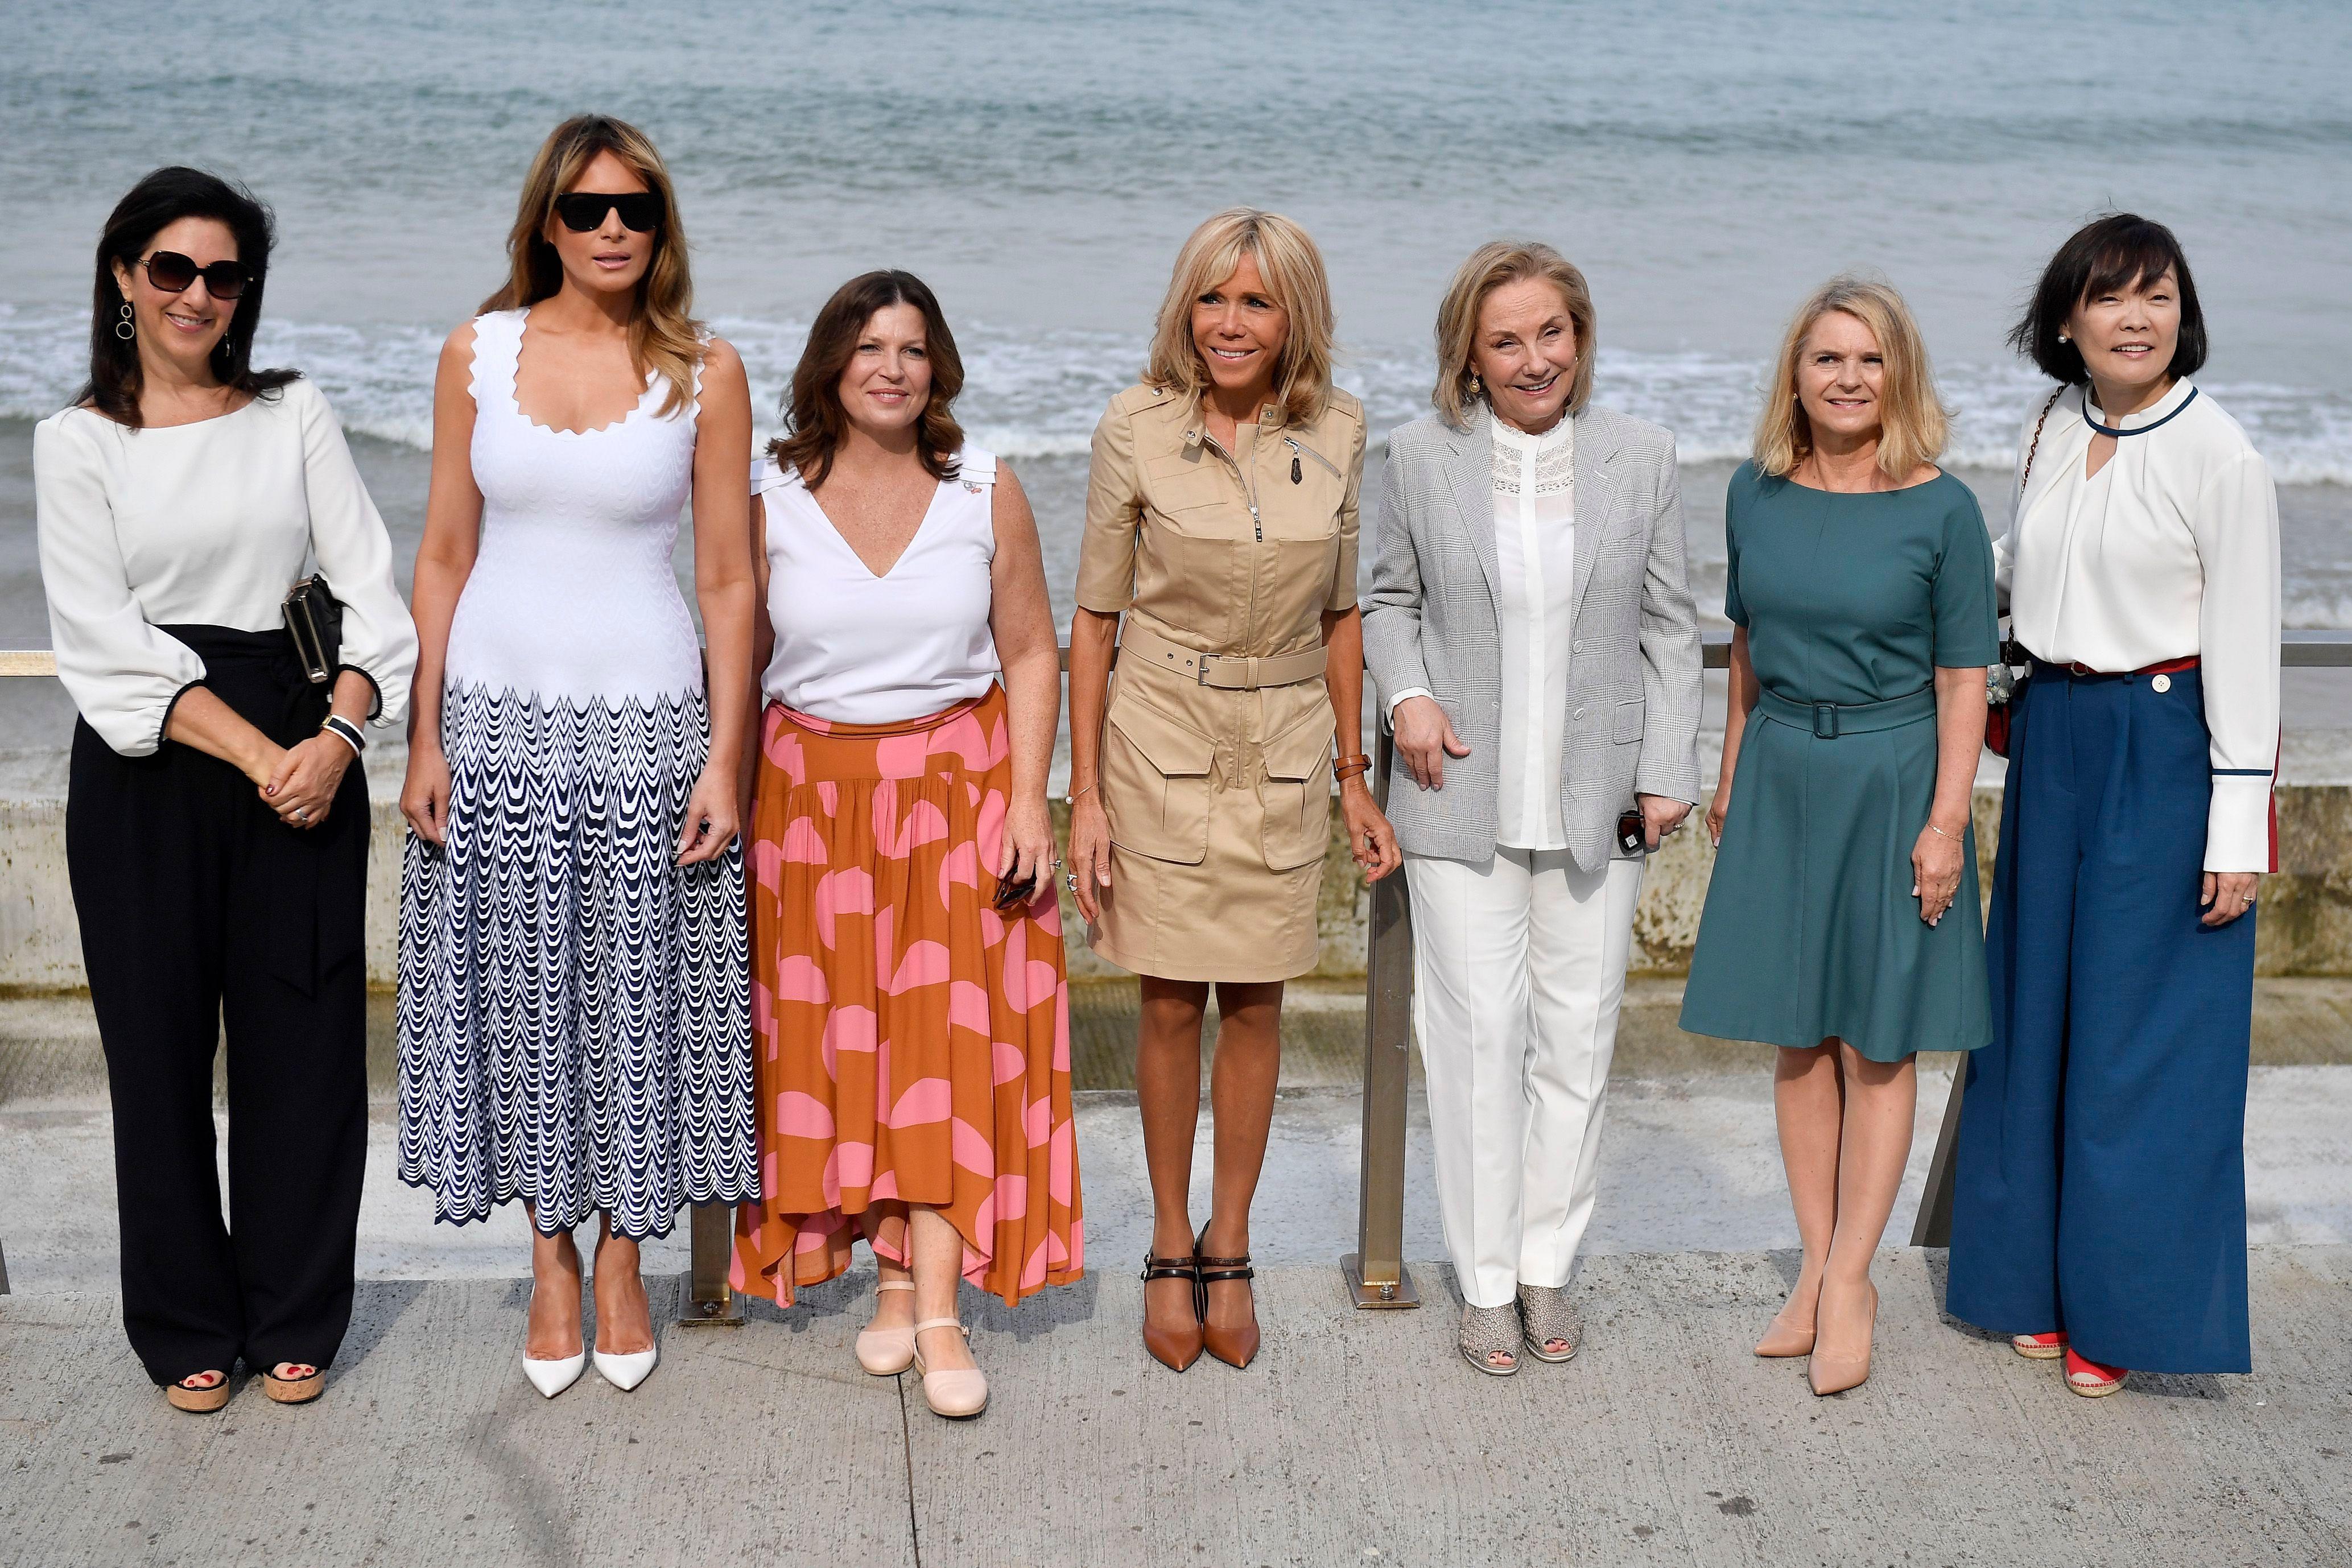 (L-R) Brigitte Macron, Melania Trump, Akie Abe, Jenny Morrison, Malgorzata Tusk, and Adele Malpass at the Cote des Basques beach as part of the G7 summit, in Biarritz, France.